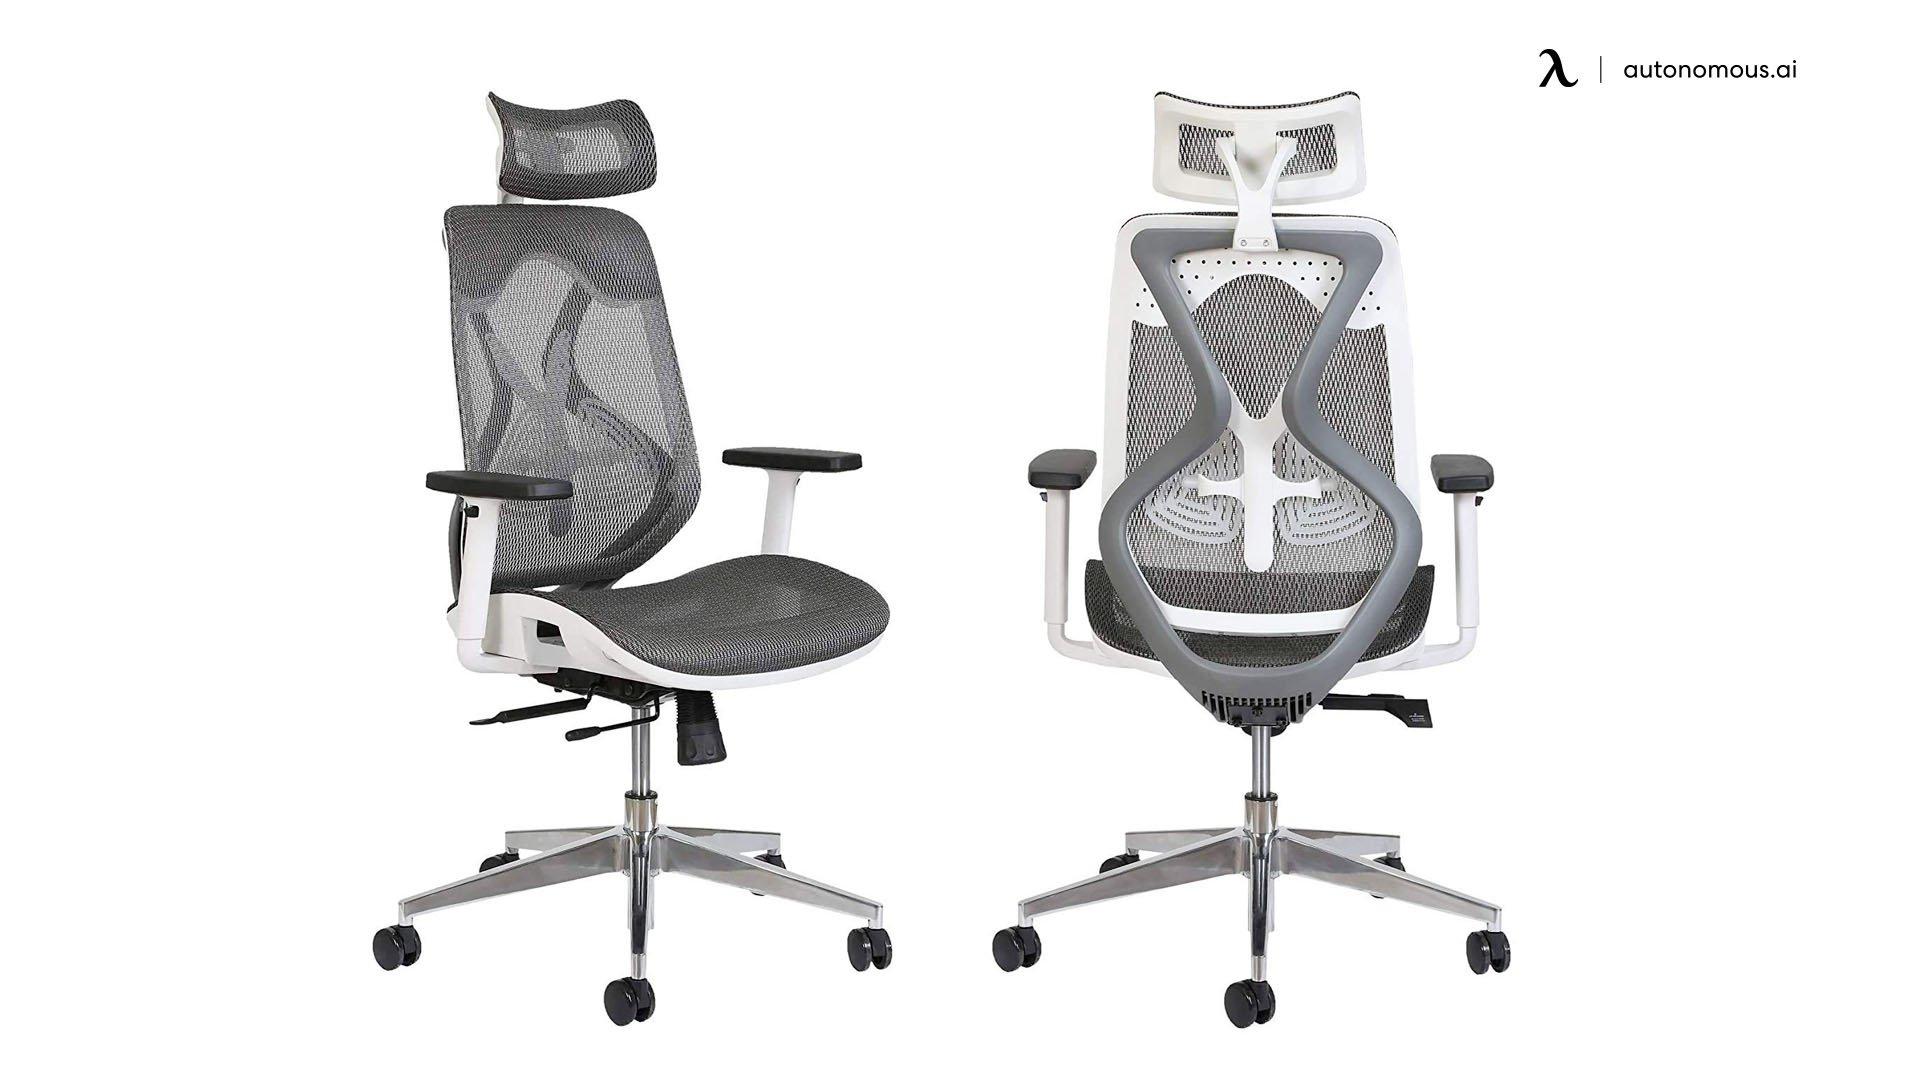 MISURAA Imported Xenon High Back Ergonomic Chair